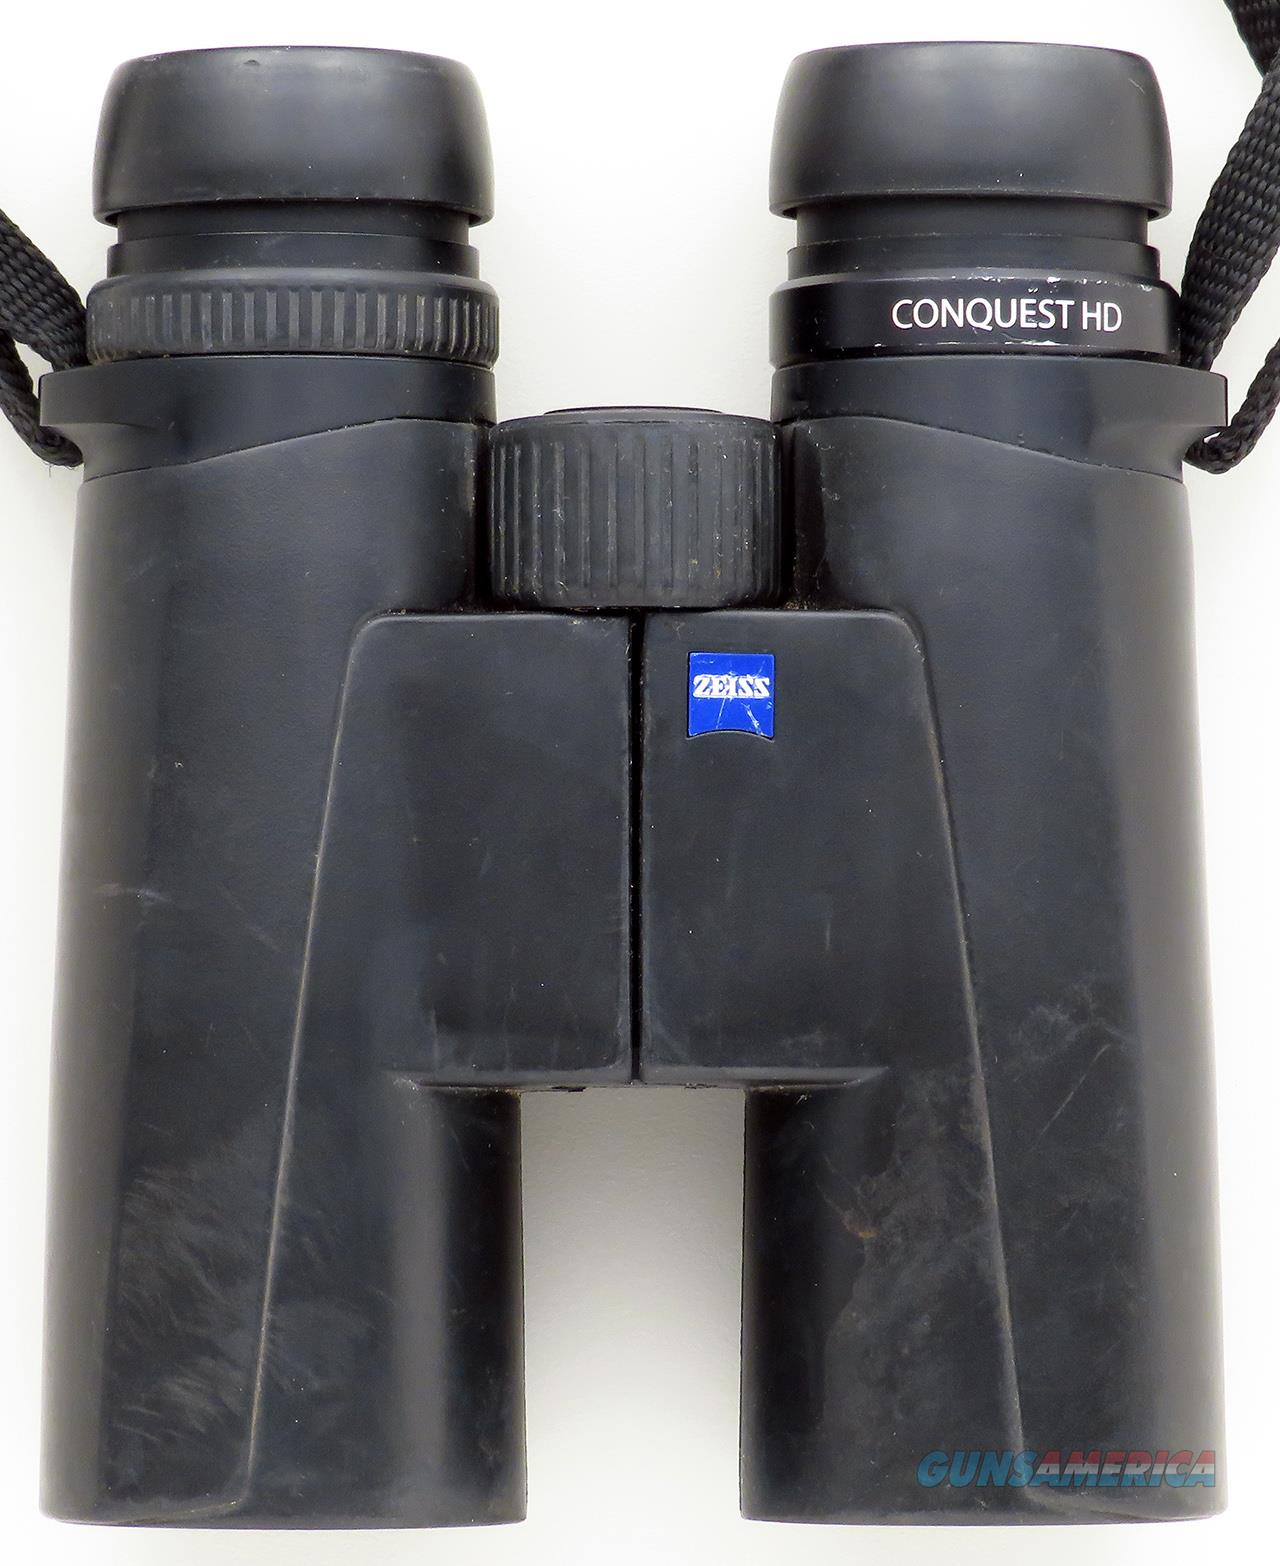 Zeiss 8x42mm Conquest HD binoculars  Non-Guns > Scopes/Mounts/Rings & Optics > Non-Scope Optics > Binoculars